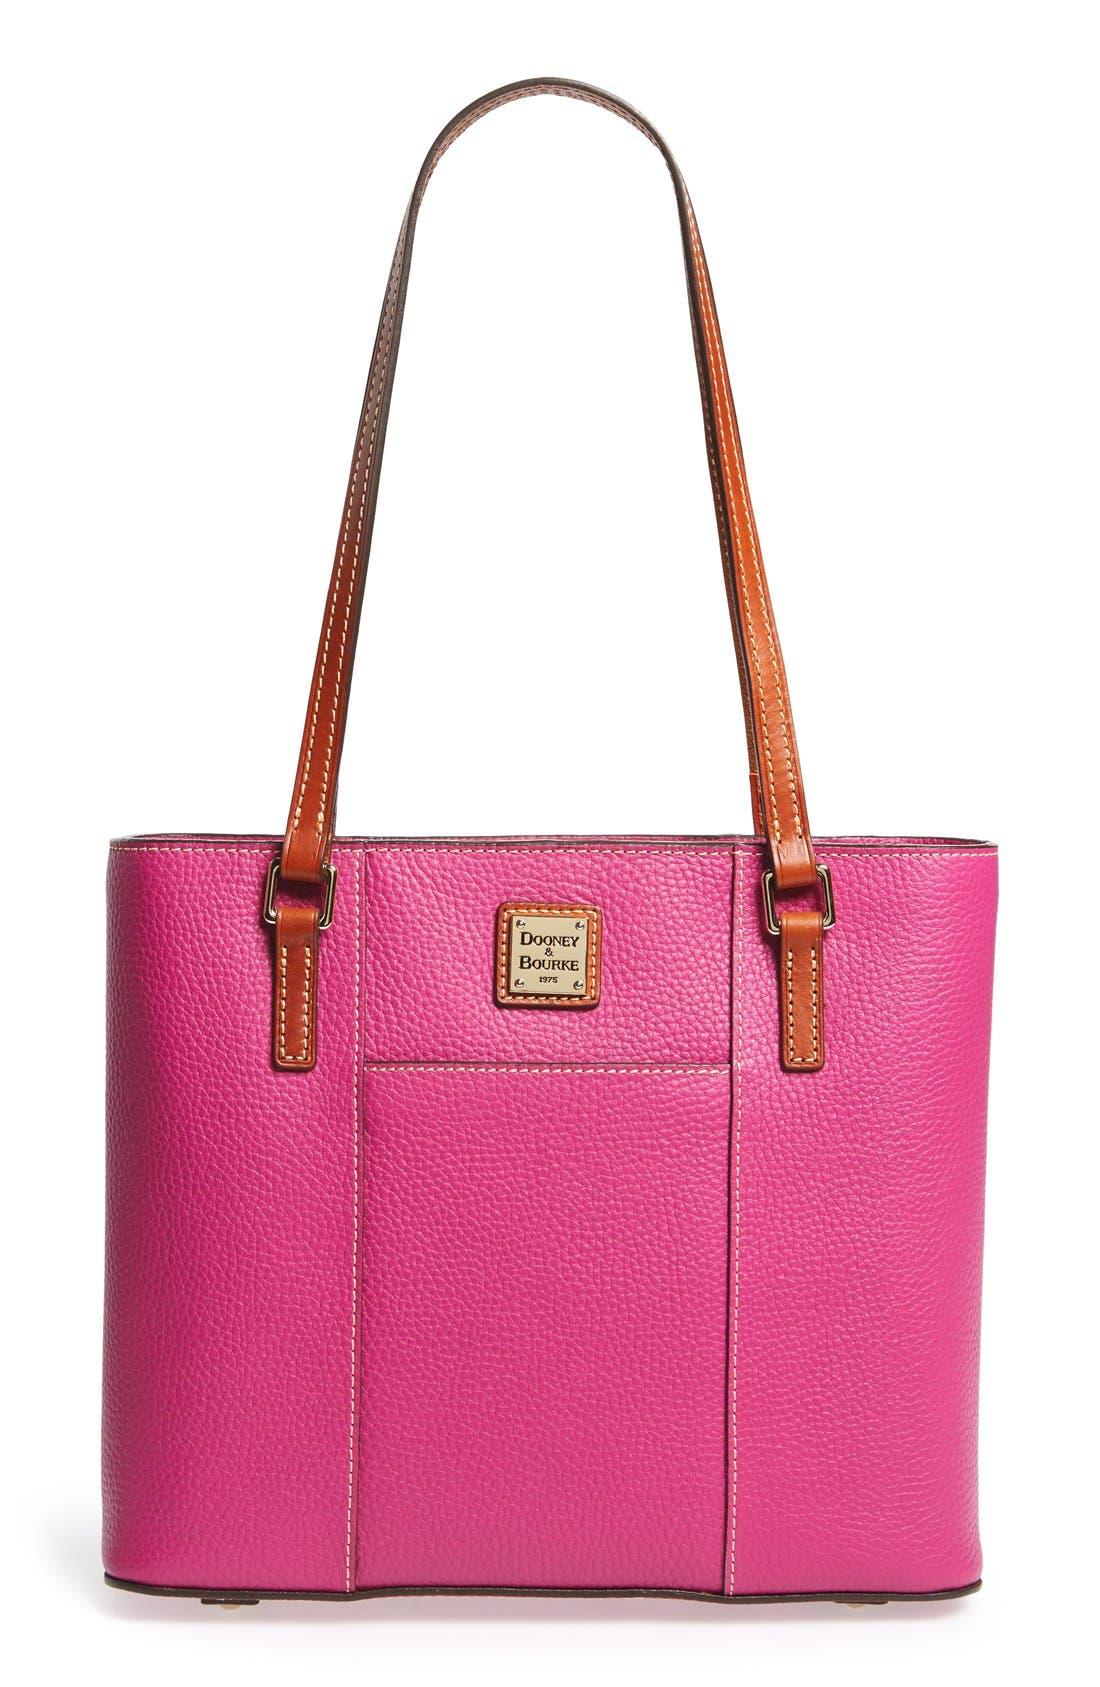 Main Image - Dooney & Bourke 'Small Lexington - Pebble Grain Collection' Water Resistant Leather Shopper